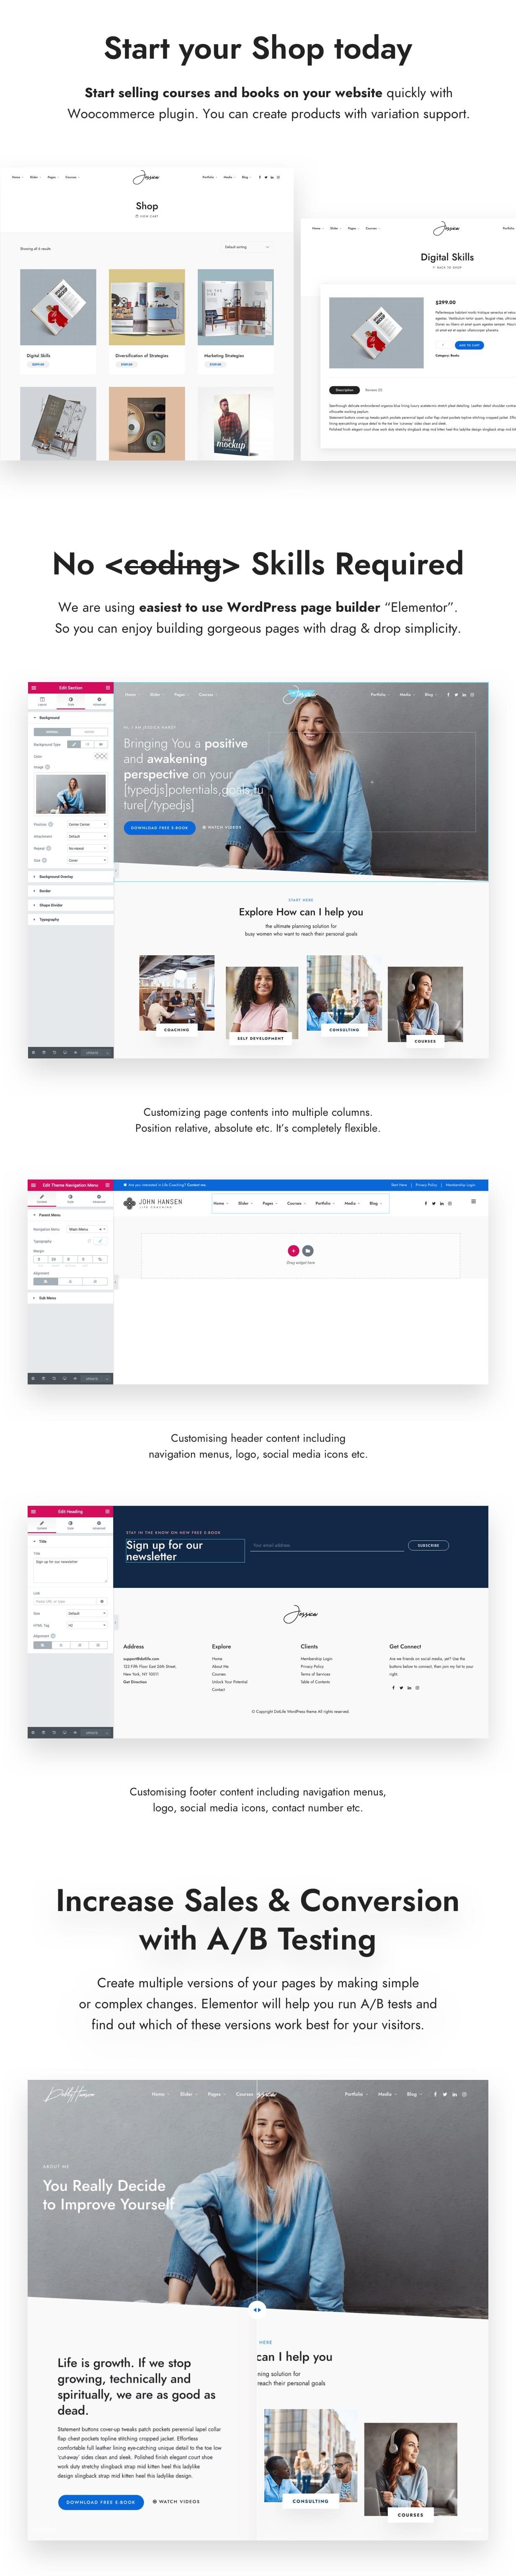 1624717046 95 elementor - DotLife | Coach Online Courses WordPress